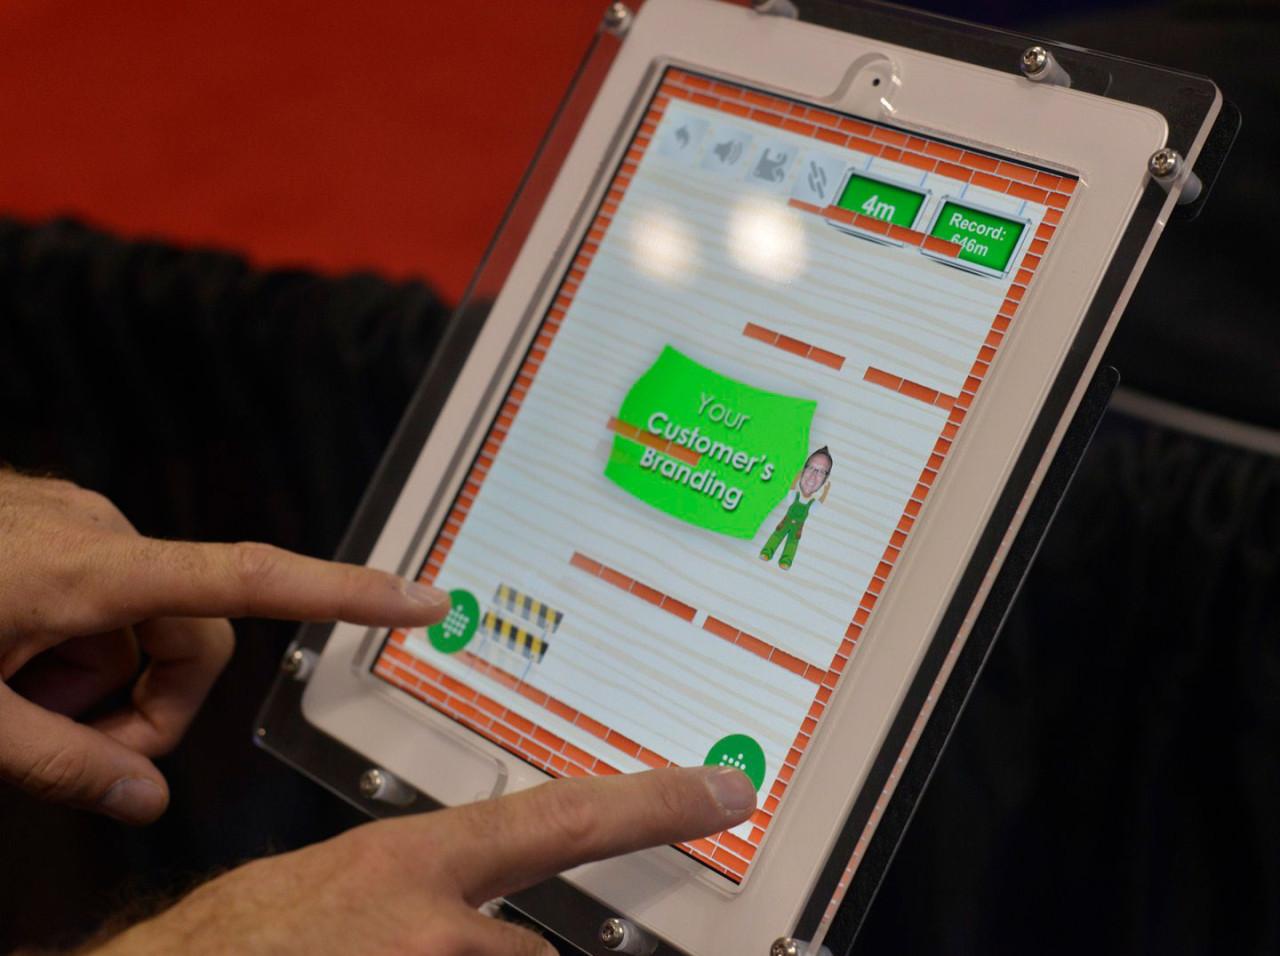 Virtual Hero, Game Studio: Playing on a Tablet